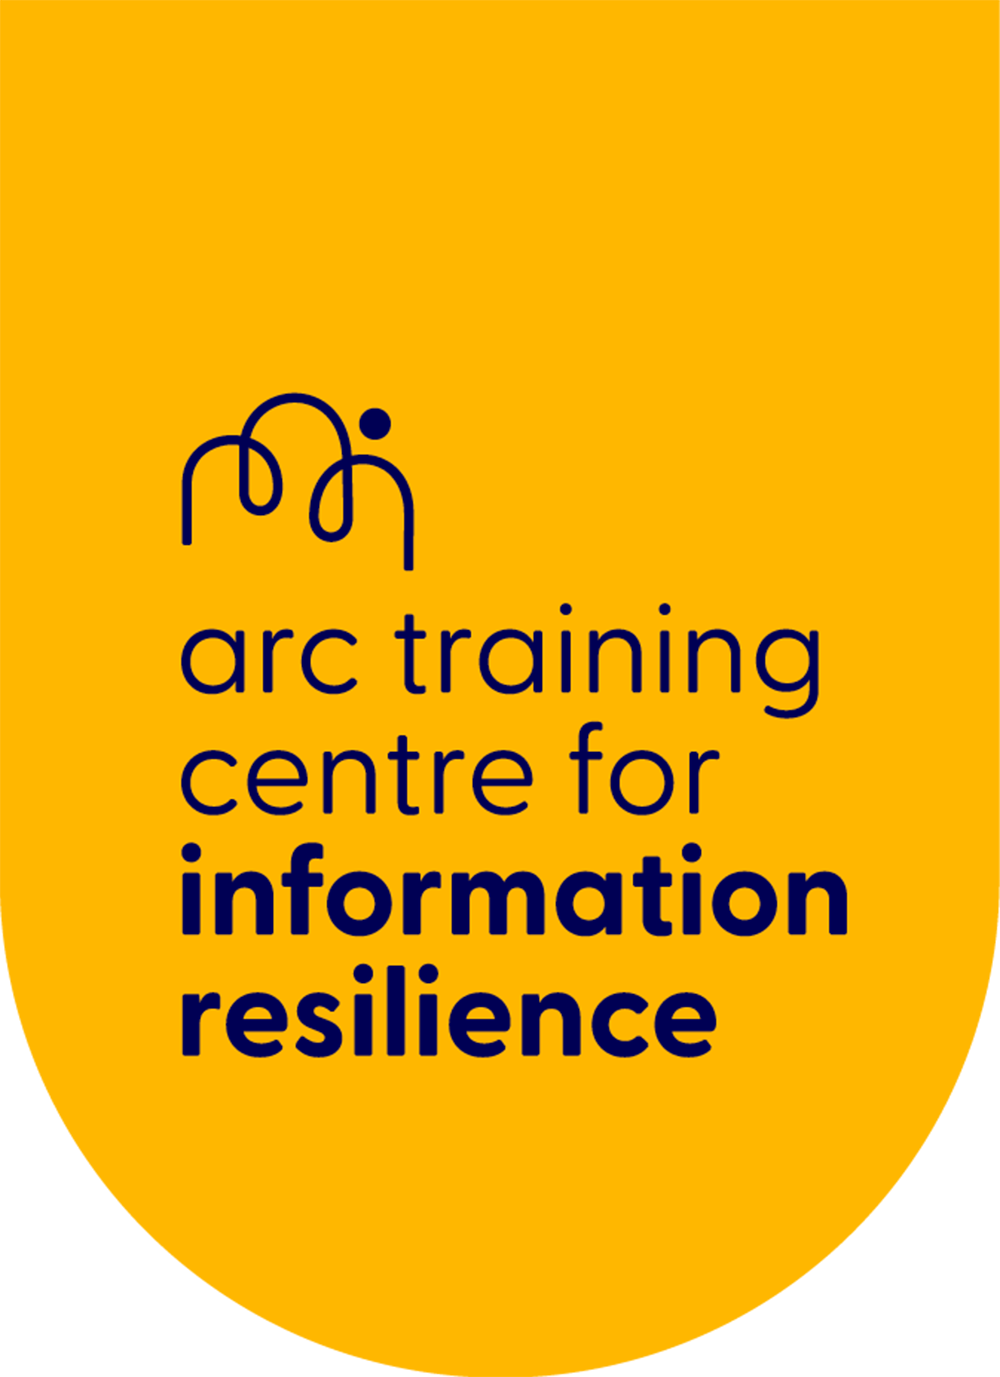 ARC Training Centre